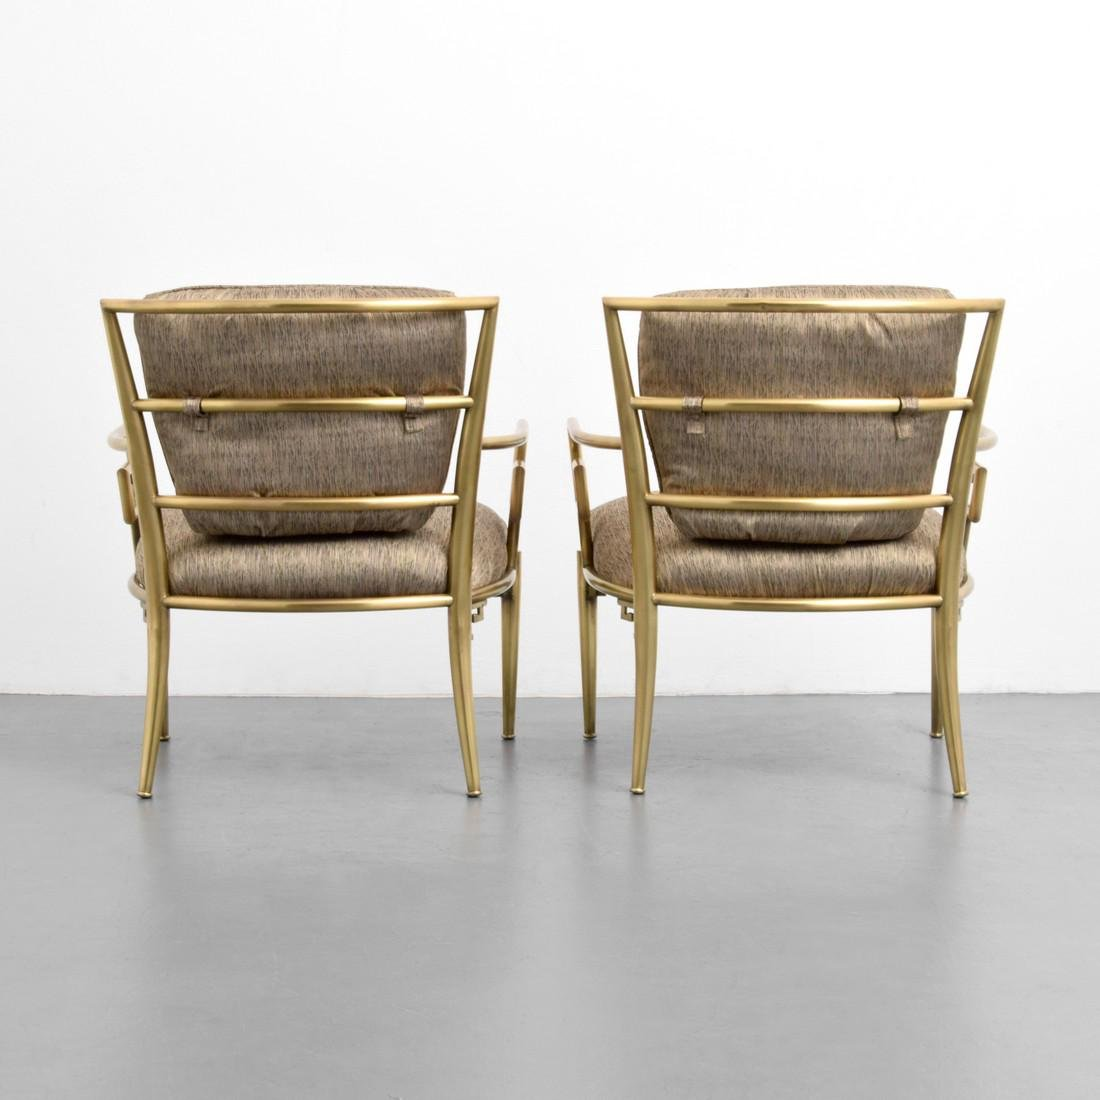 Greek Key Lounge Chairs, Attributed to Mastercraft - 2